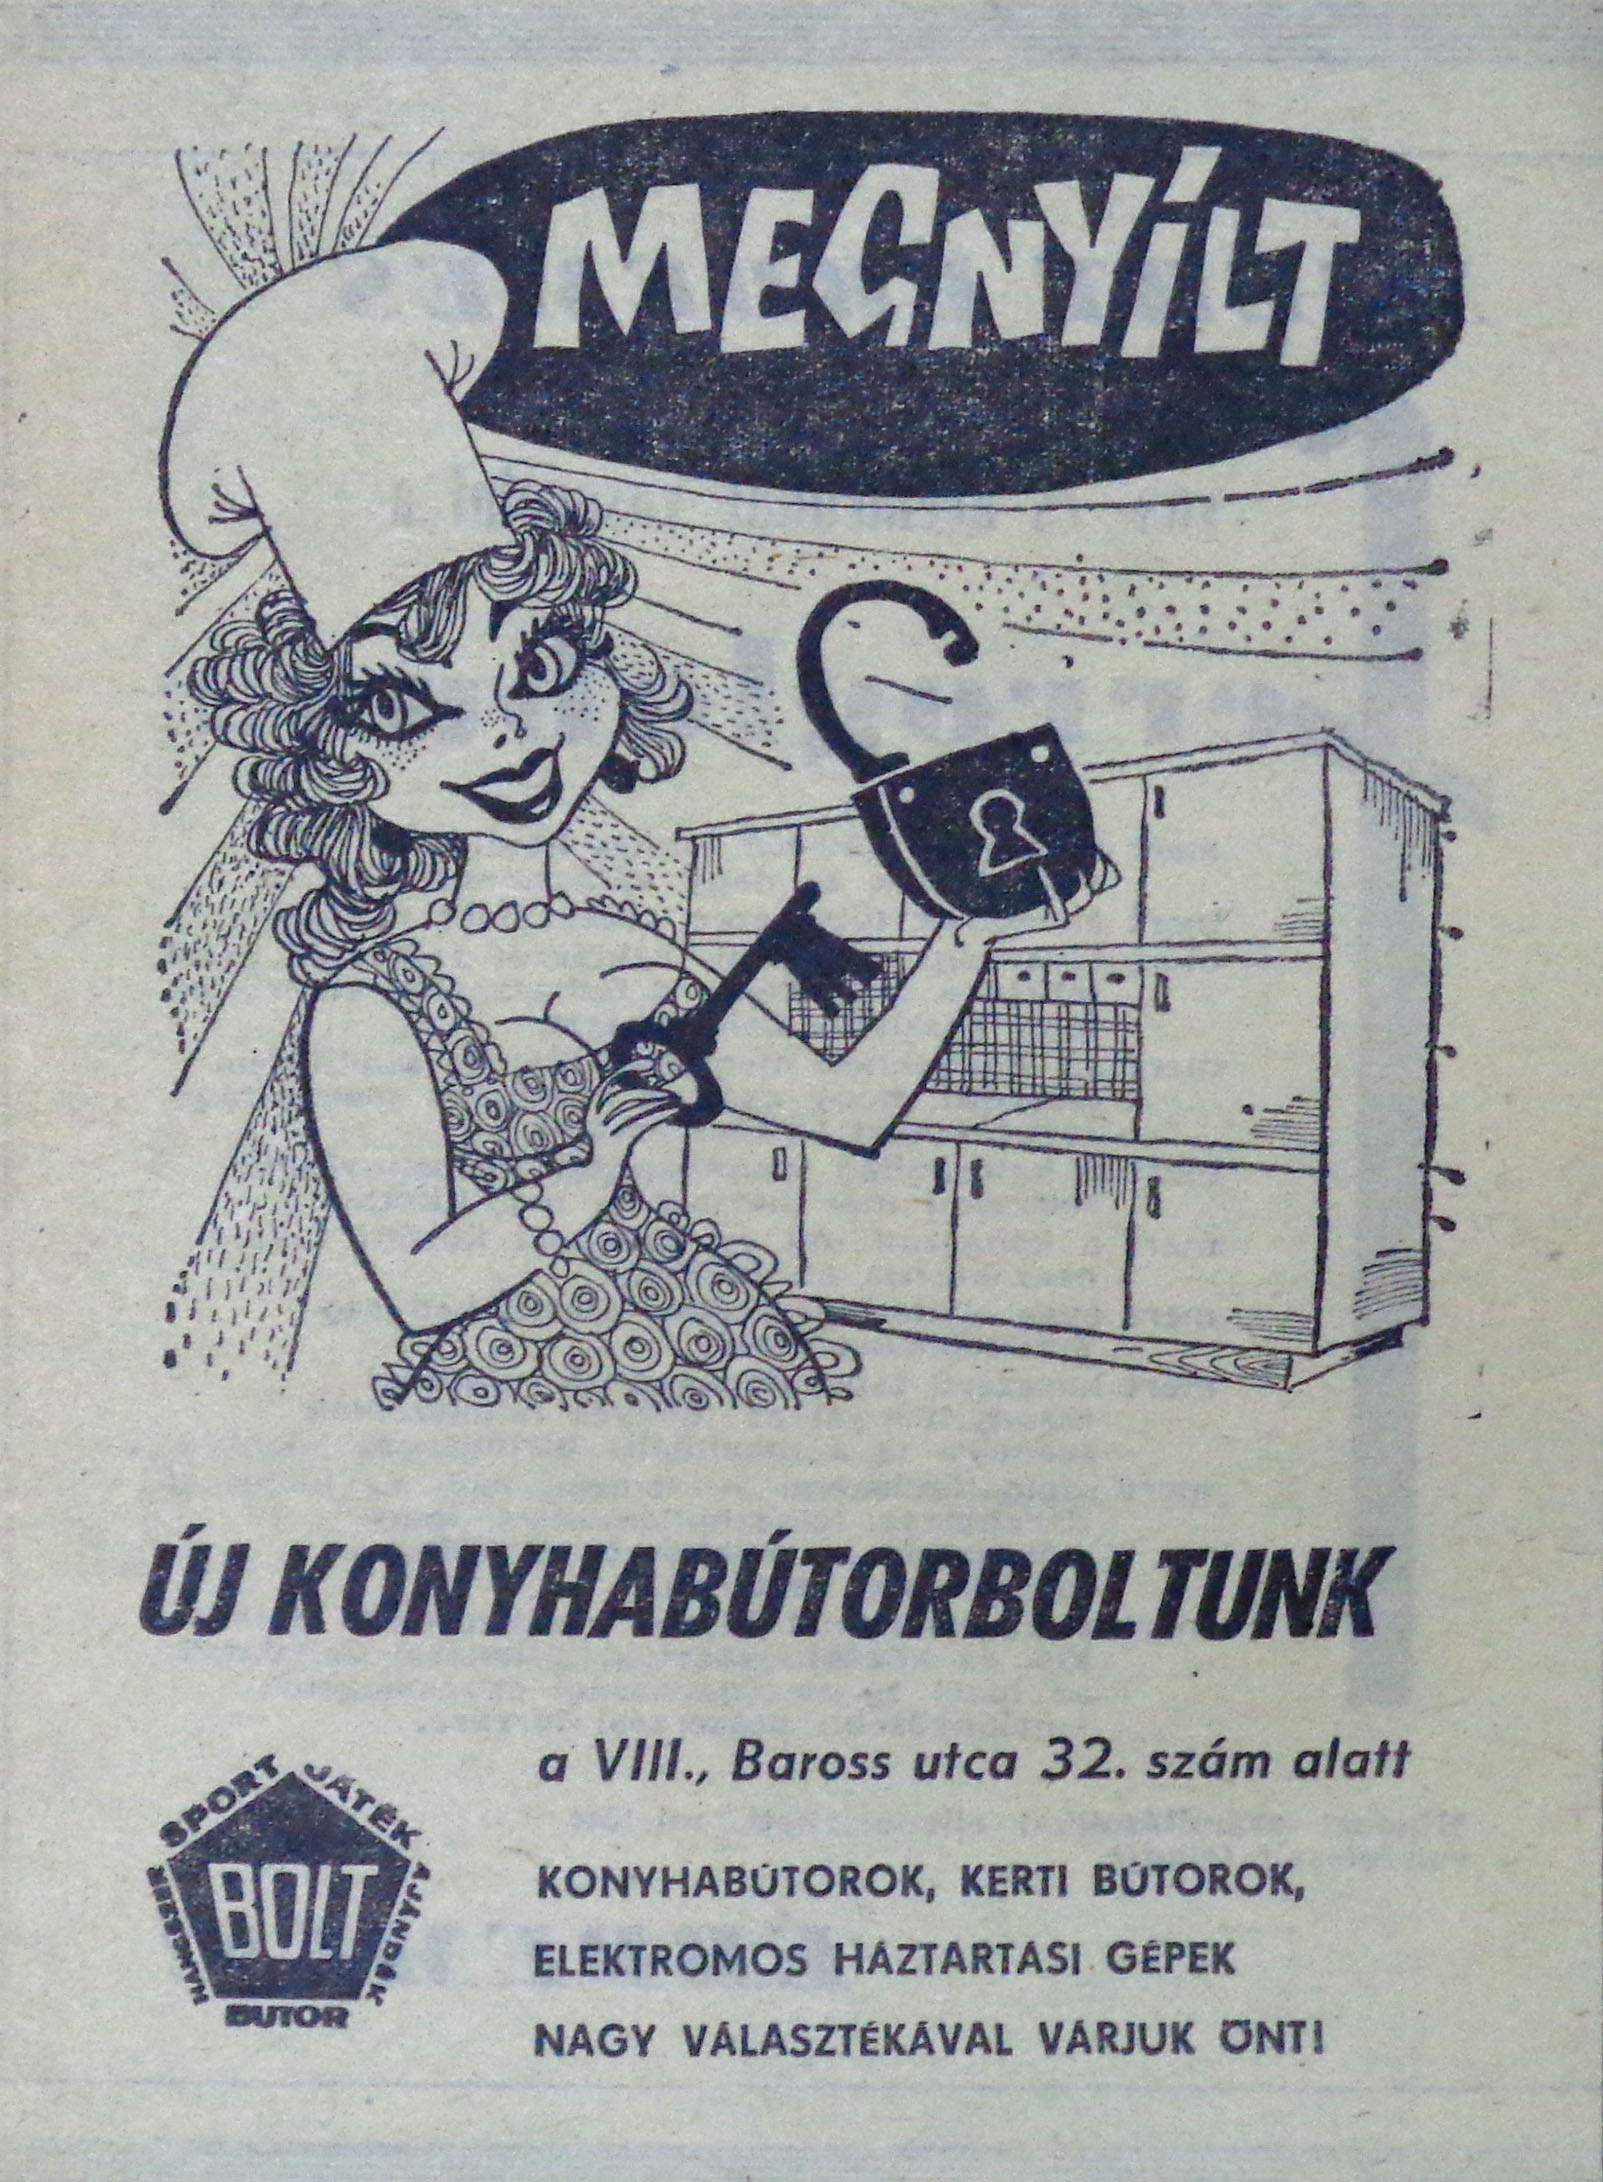 barossutca32-19700210-nepszabadsaghirdetes.jpg